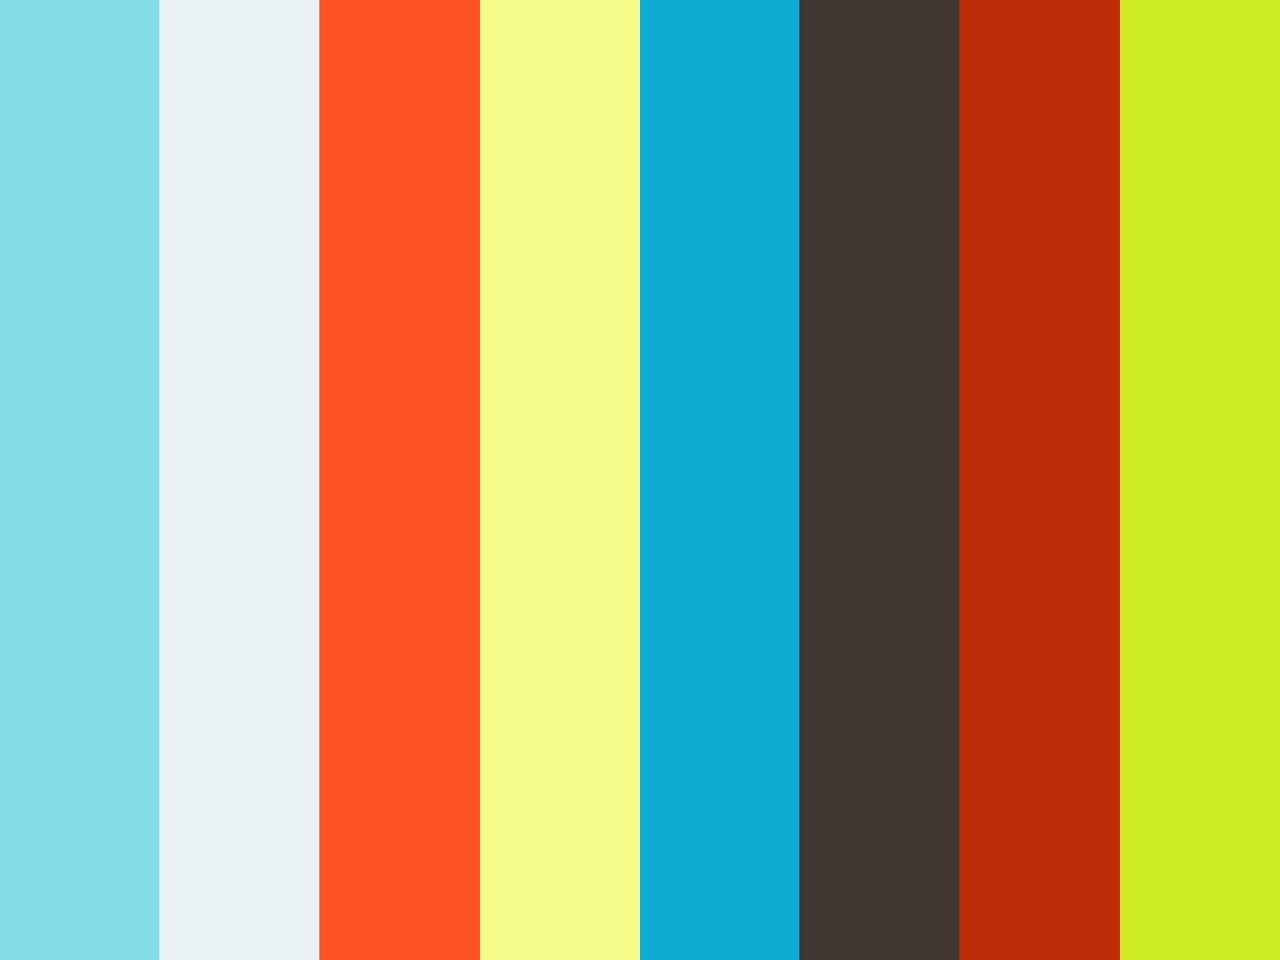 Tim wise colorblind pdf viewer